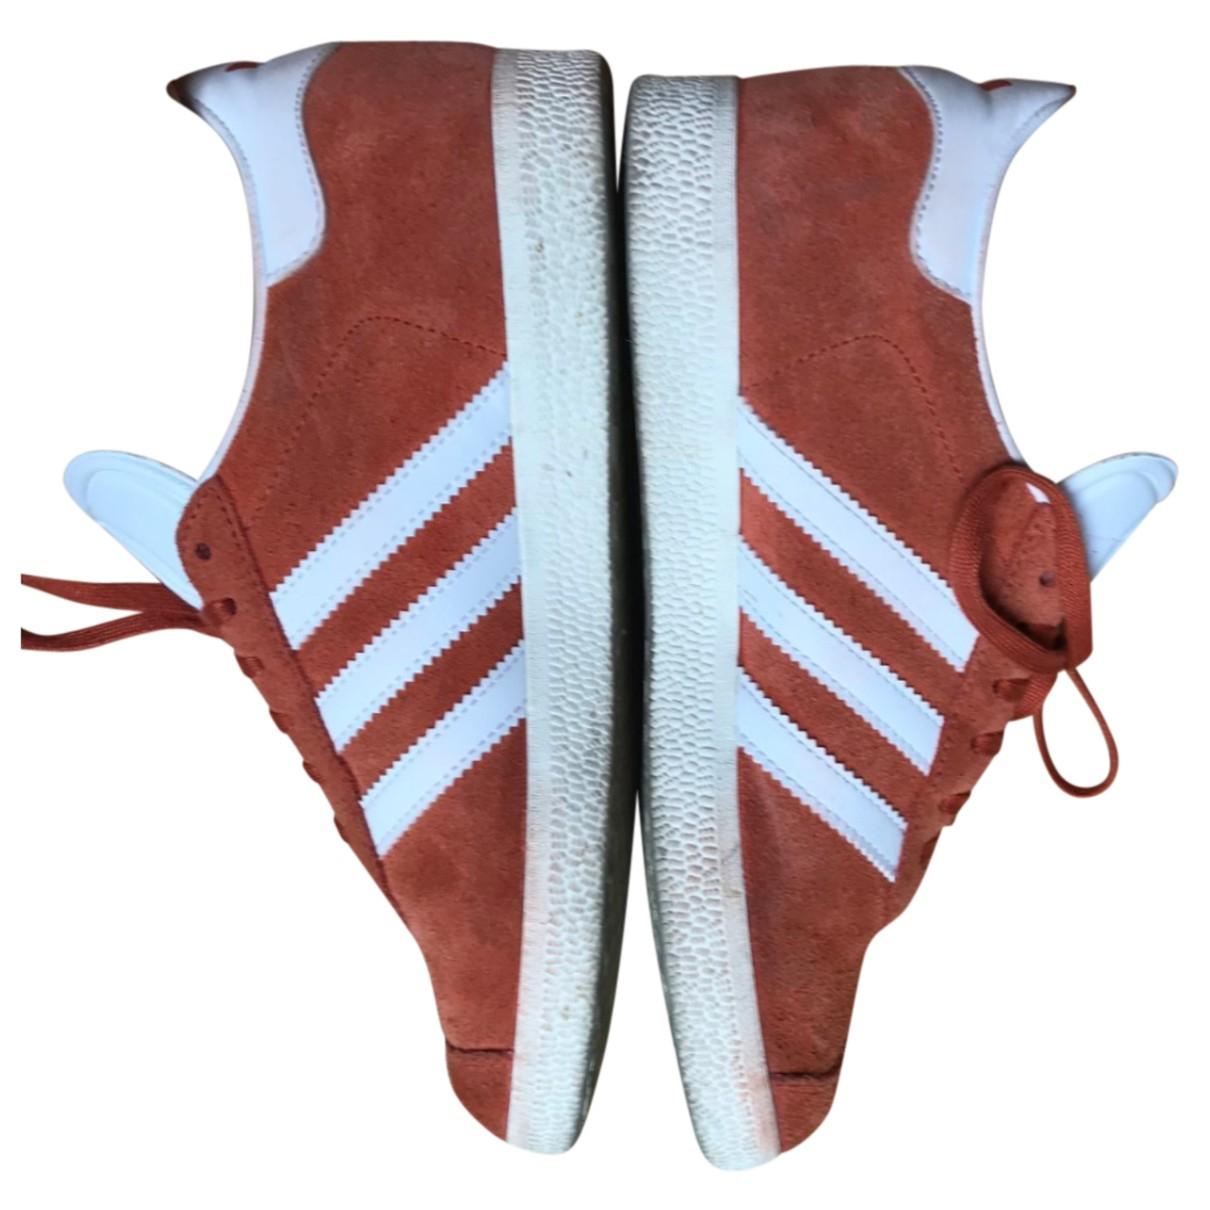 Adidas Gazelle Orange Suede Trainers for Women 36.5 EU